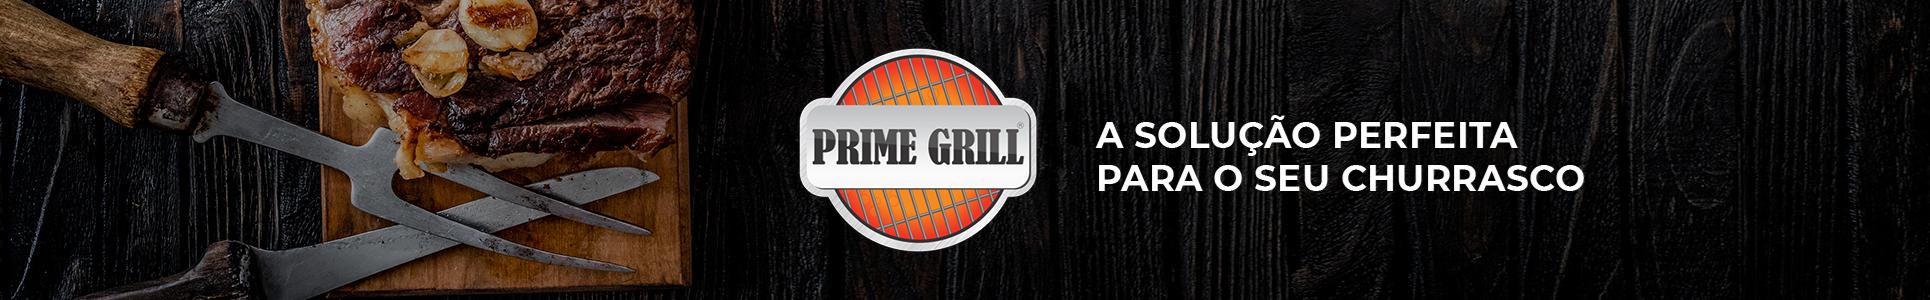 Produtos Prime Grill